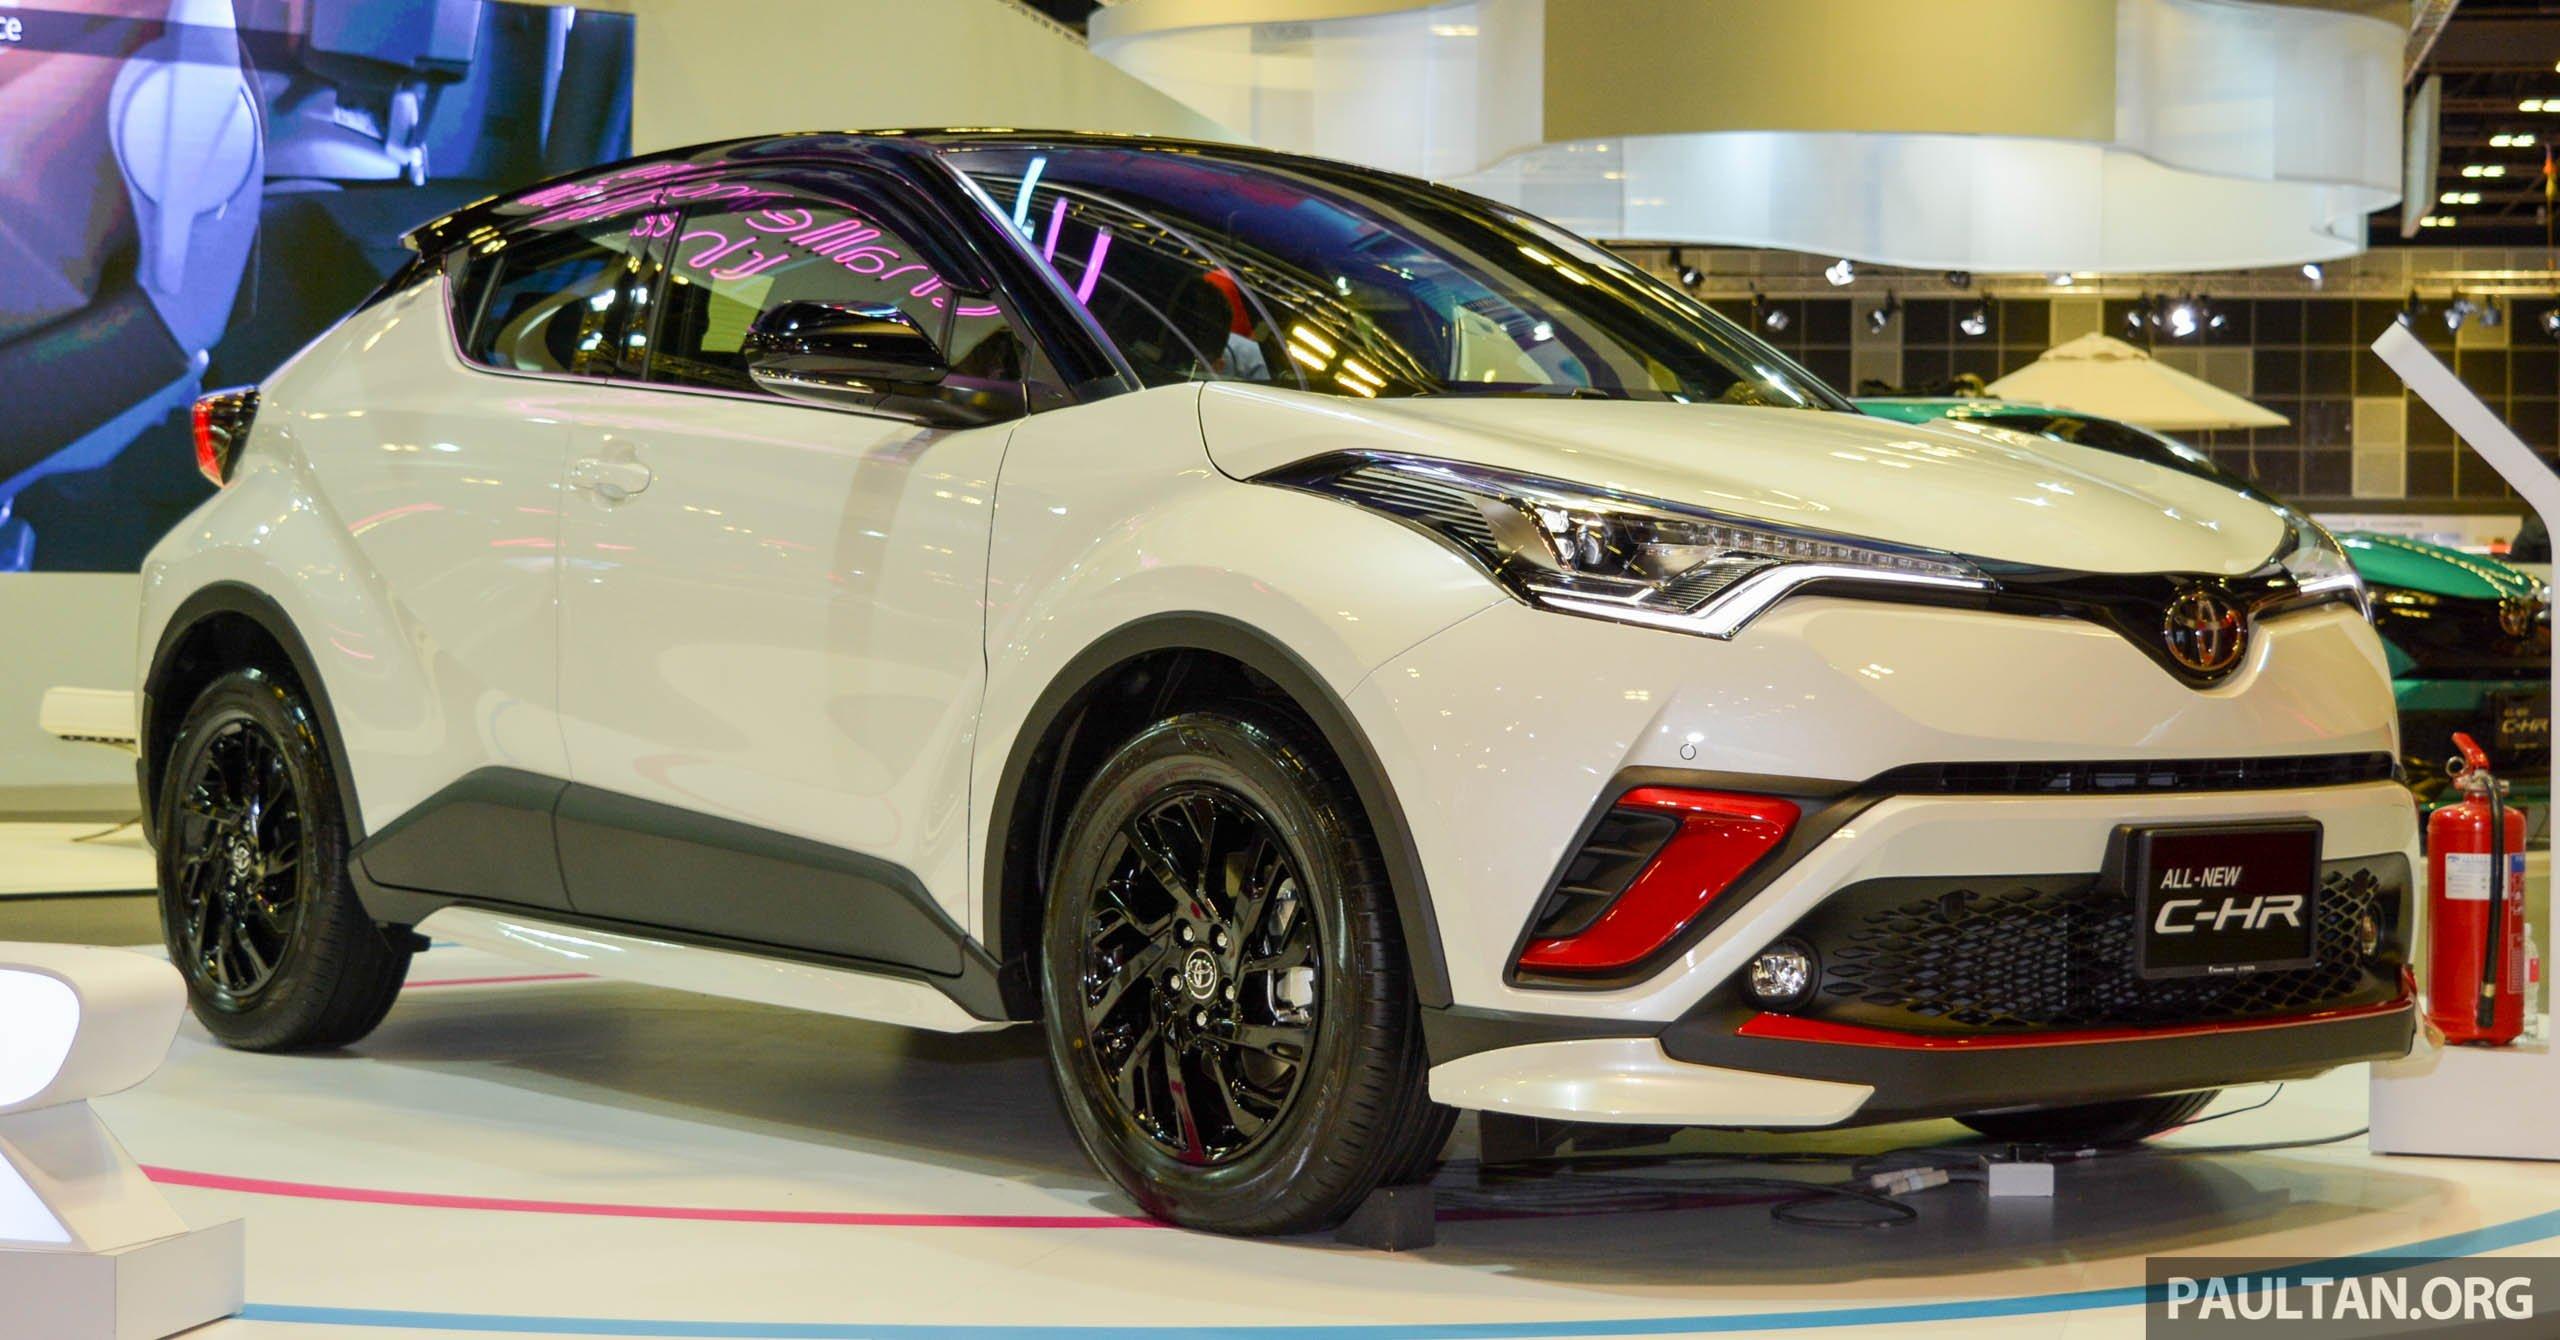 Kelebihan Toyota Turbo Top Model Tahun Ini